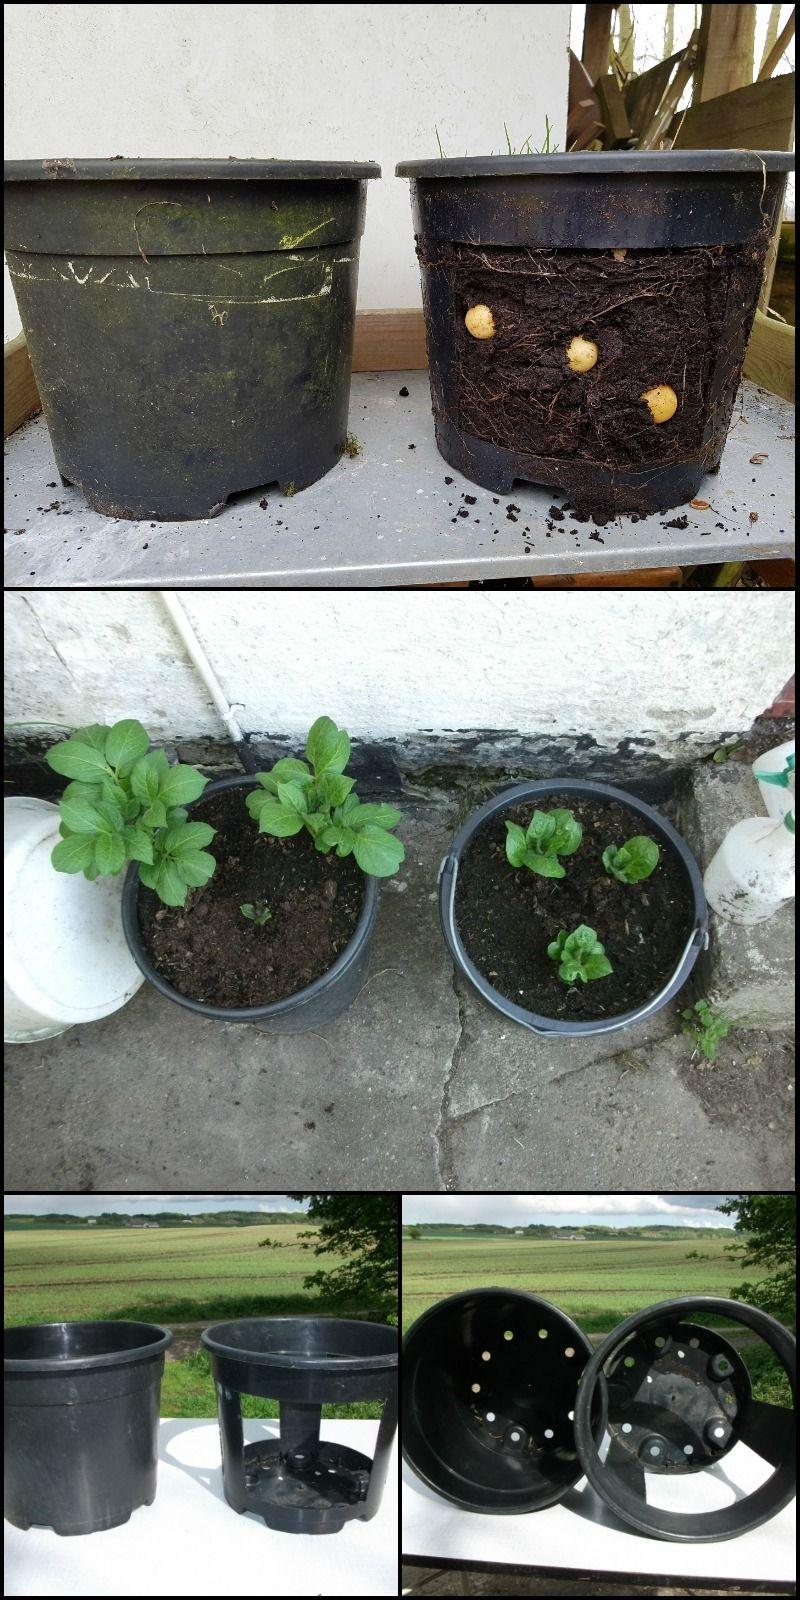 growing potatoes in buckets the no dig way potatoes growing